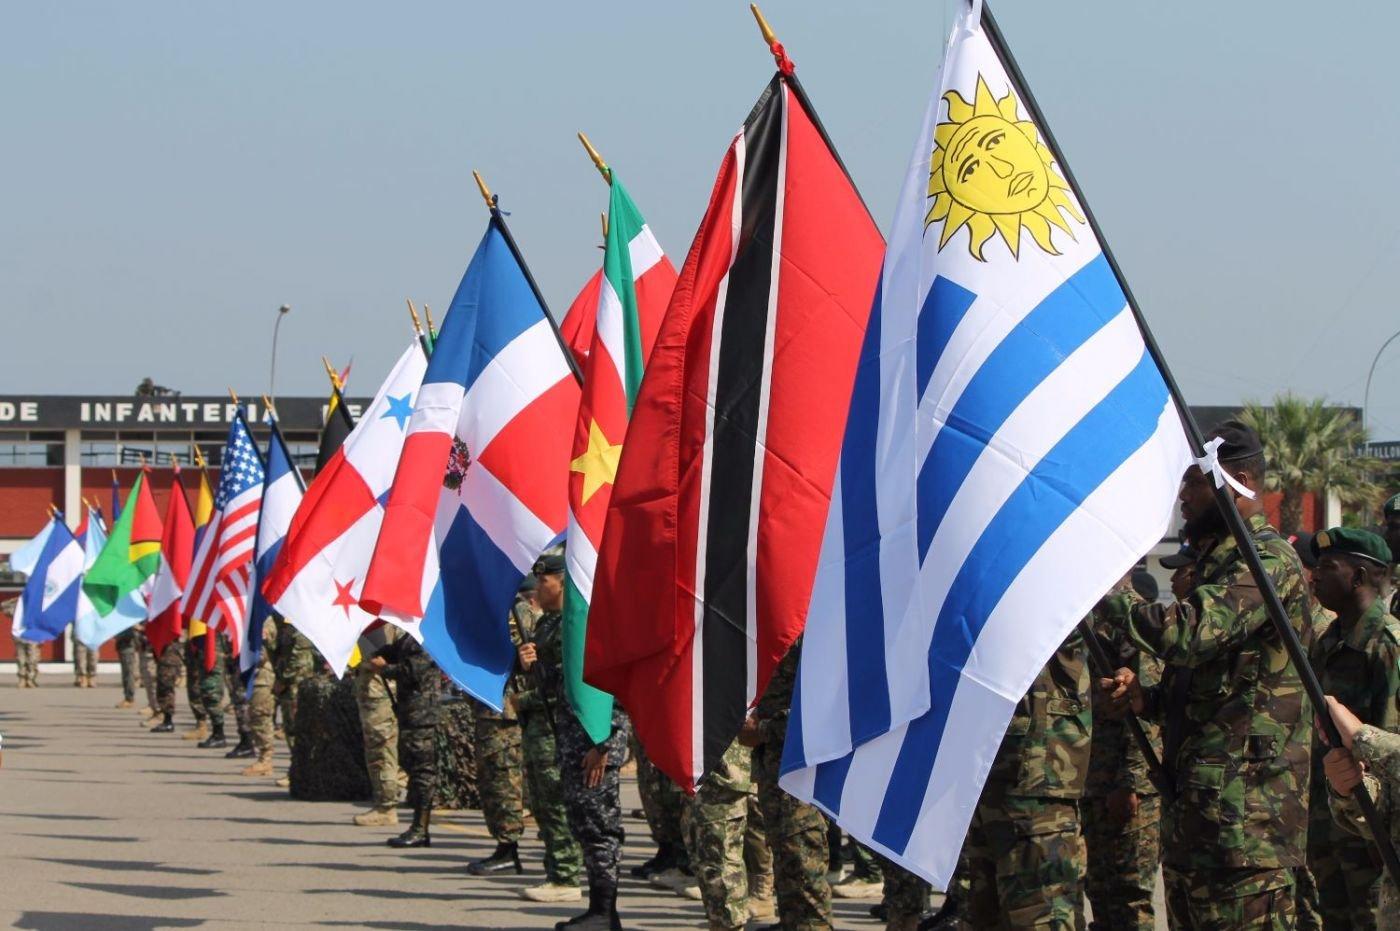 Partner Nation Special Forces Compete for 'Fuerzas Comando Peru 2016' Cup